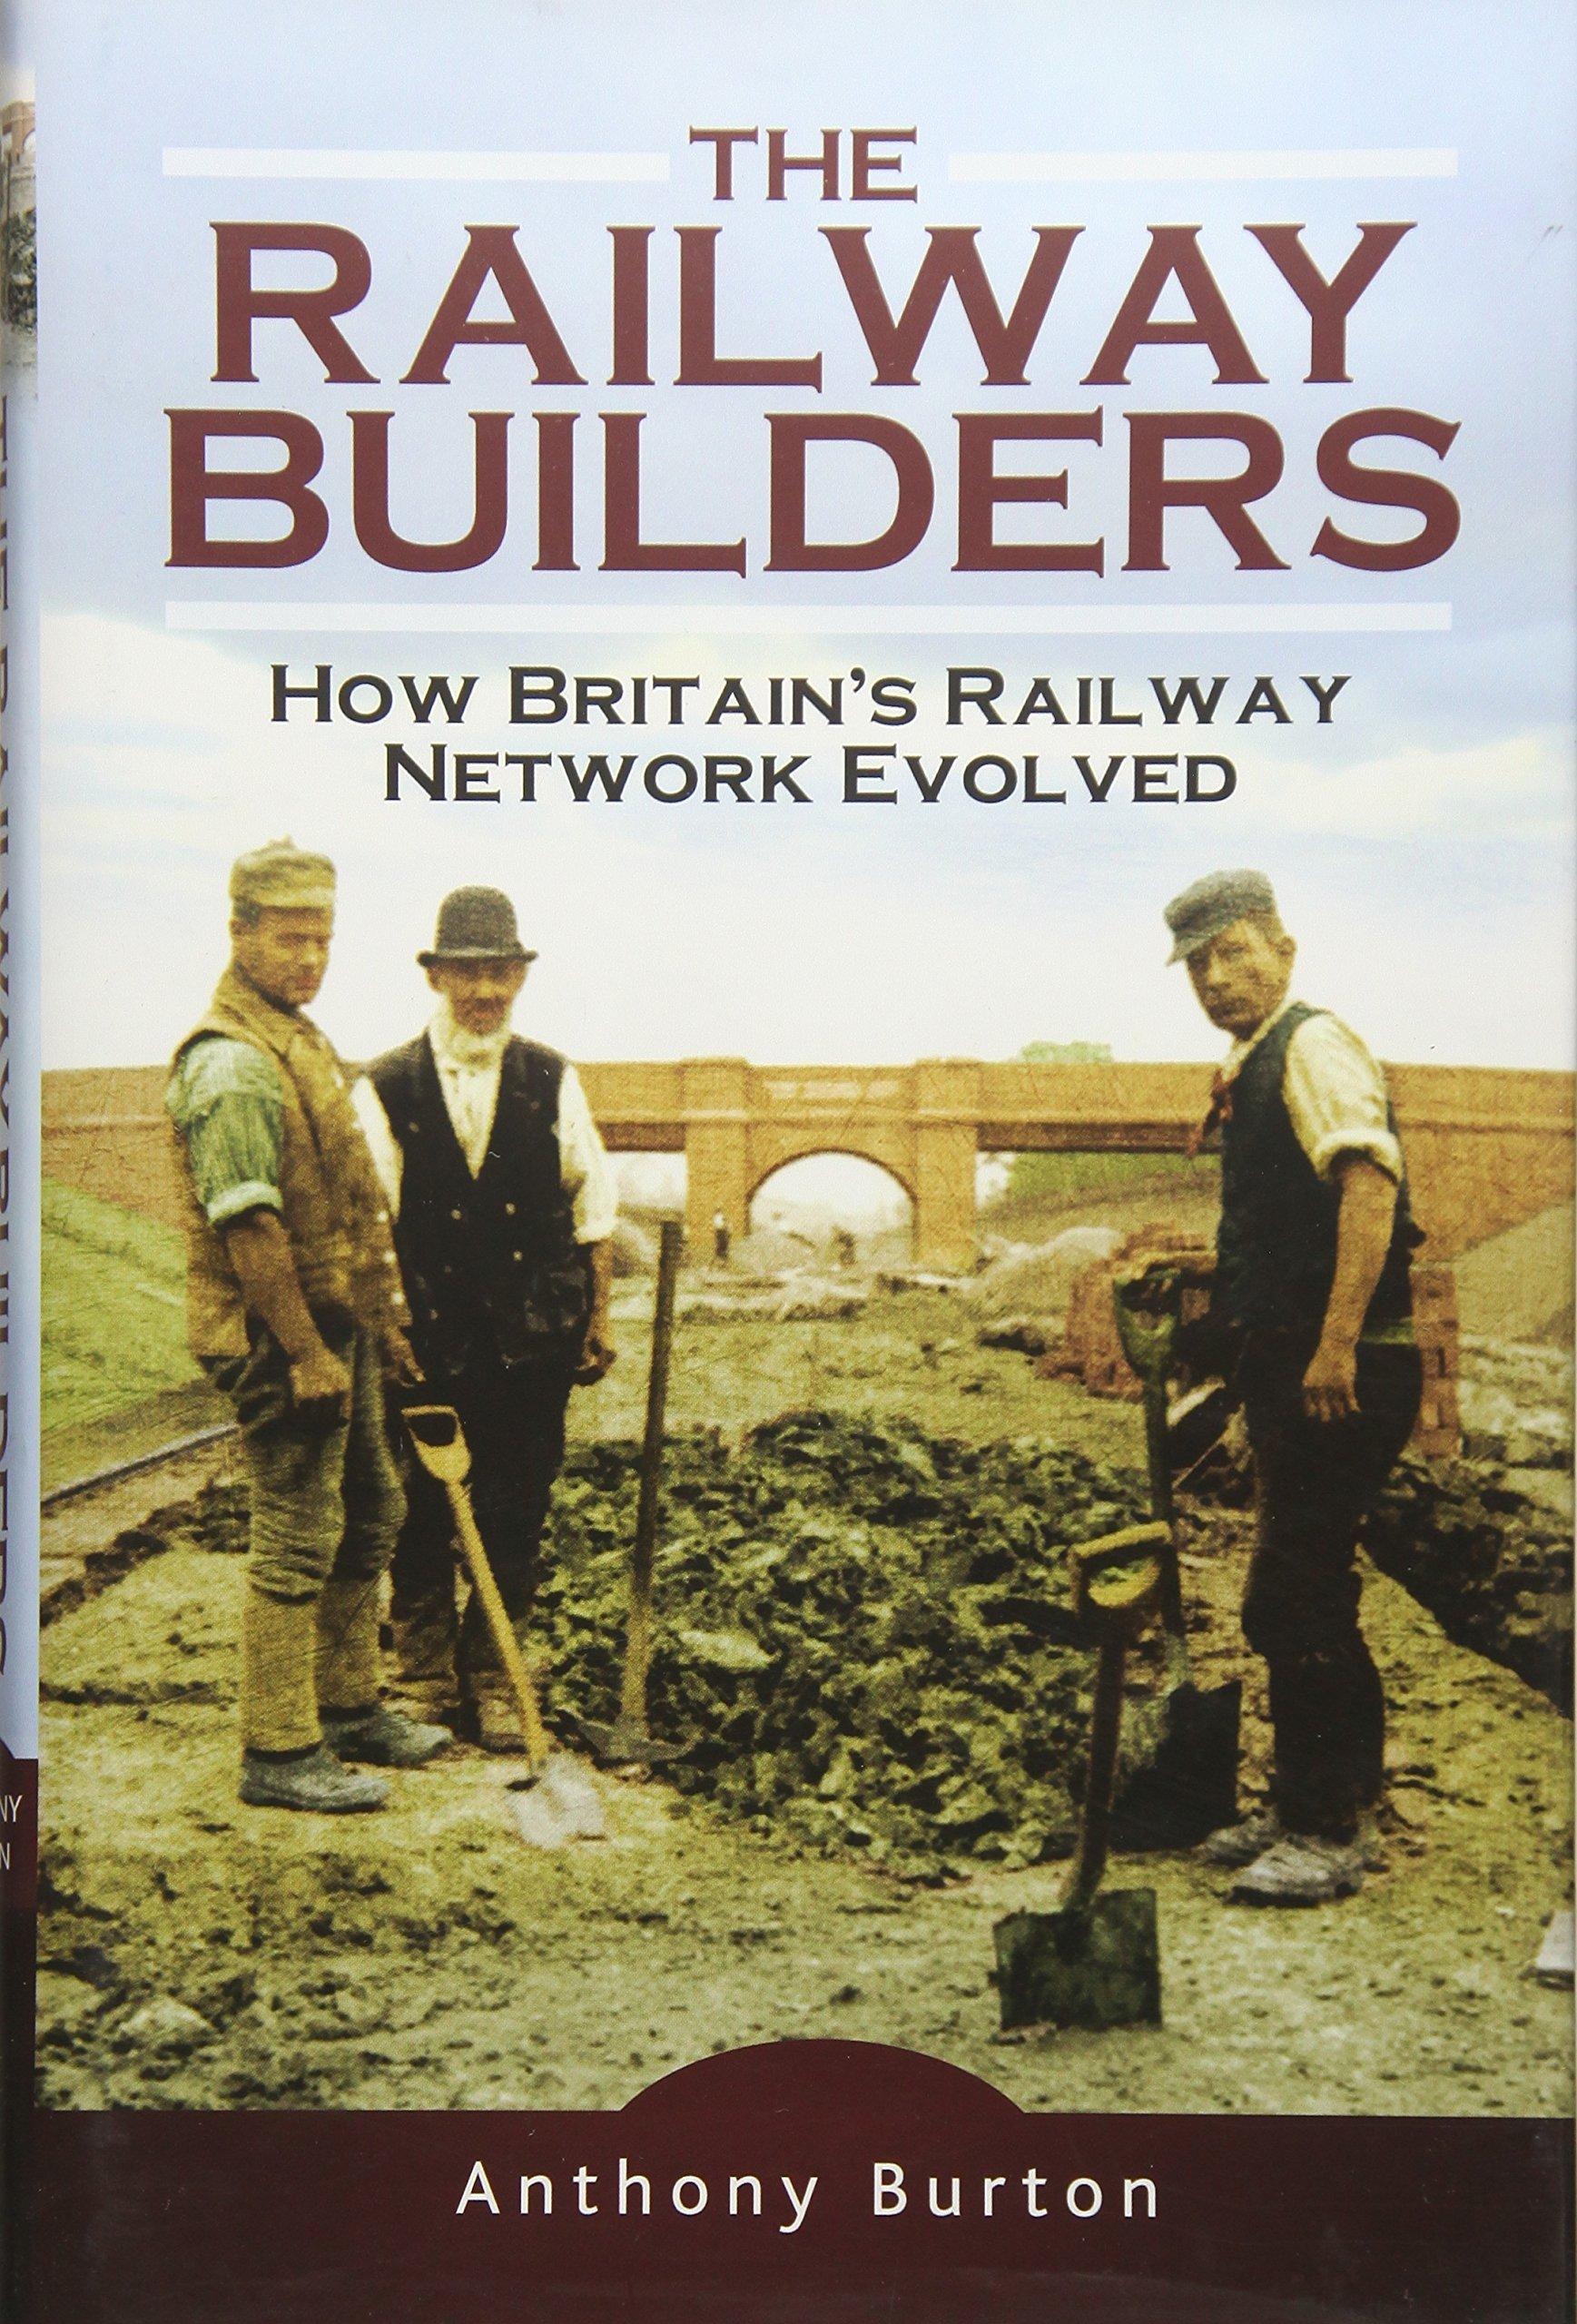 Download Railway Builders: How Britain's Railway Network Evolved ebook